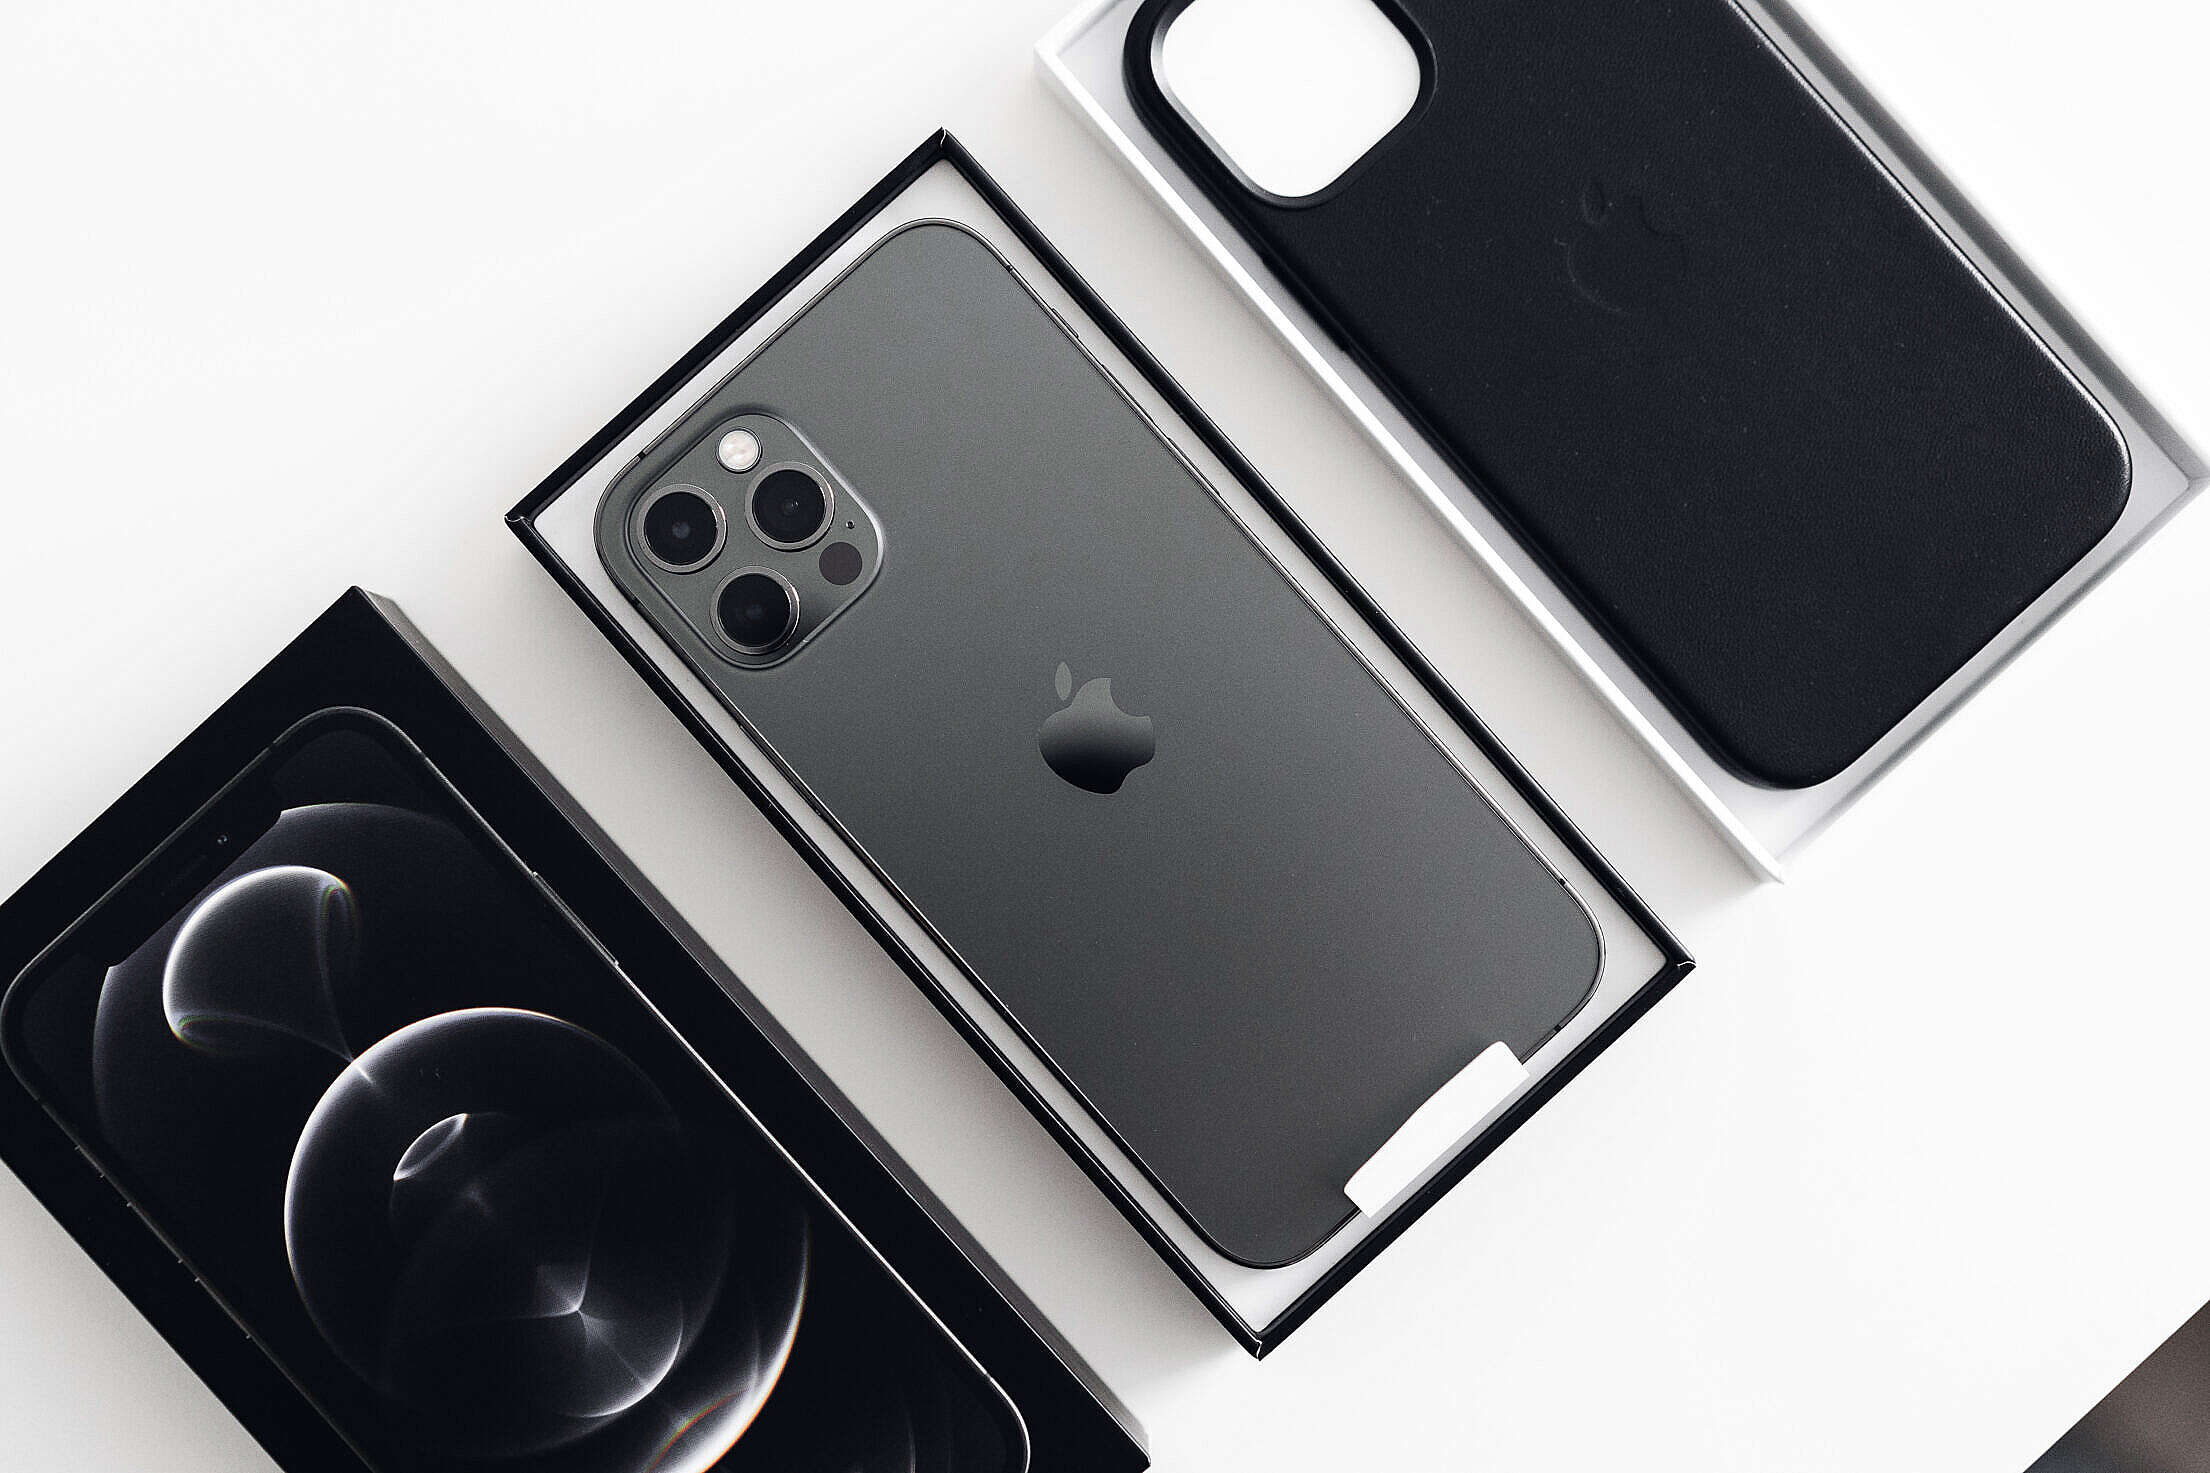 iPhone 12 Pro Unboxing Free Stock Photo